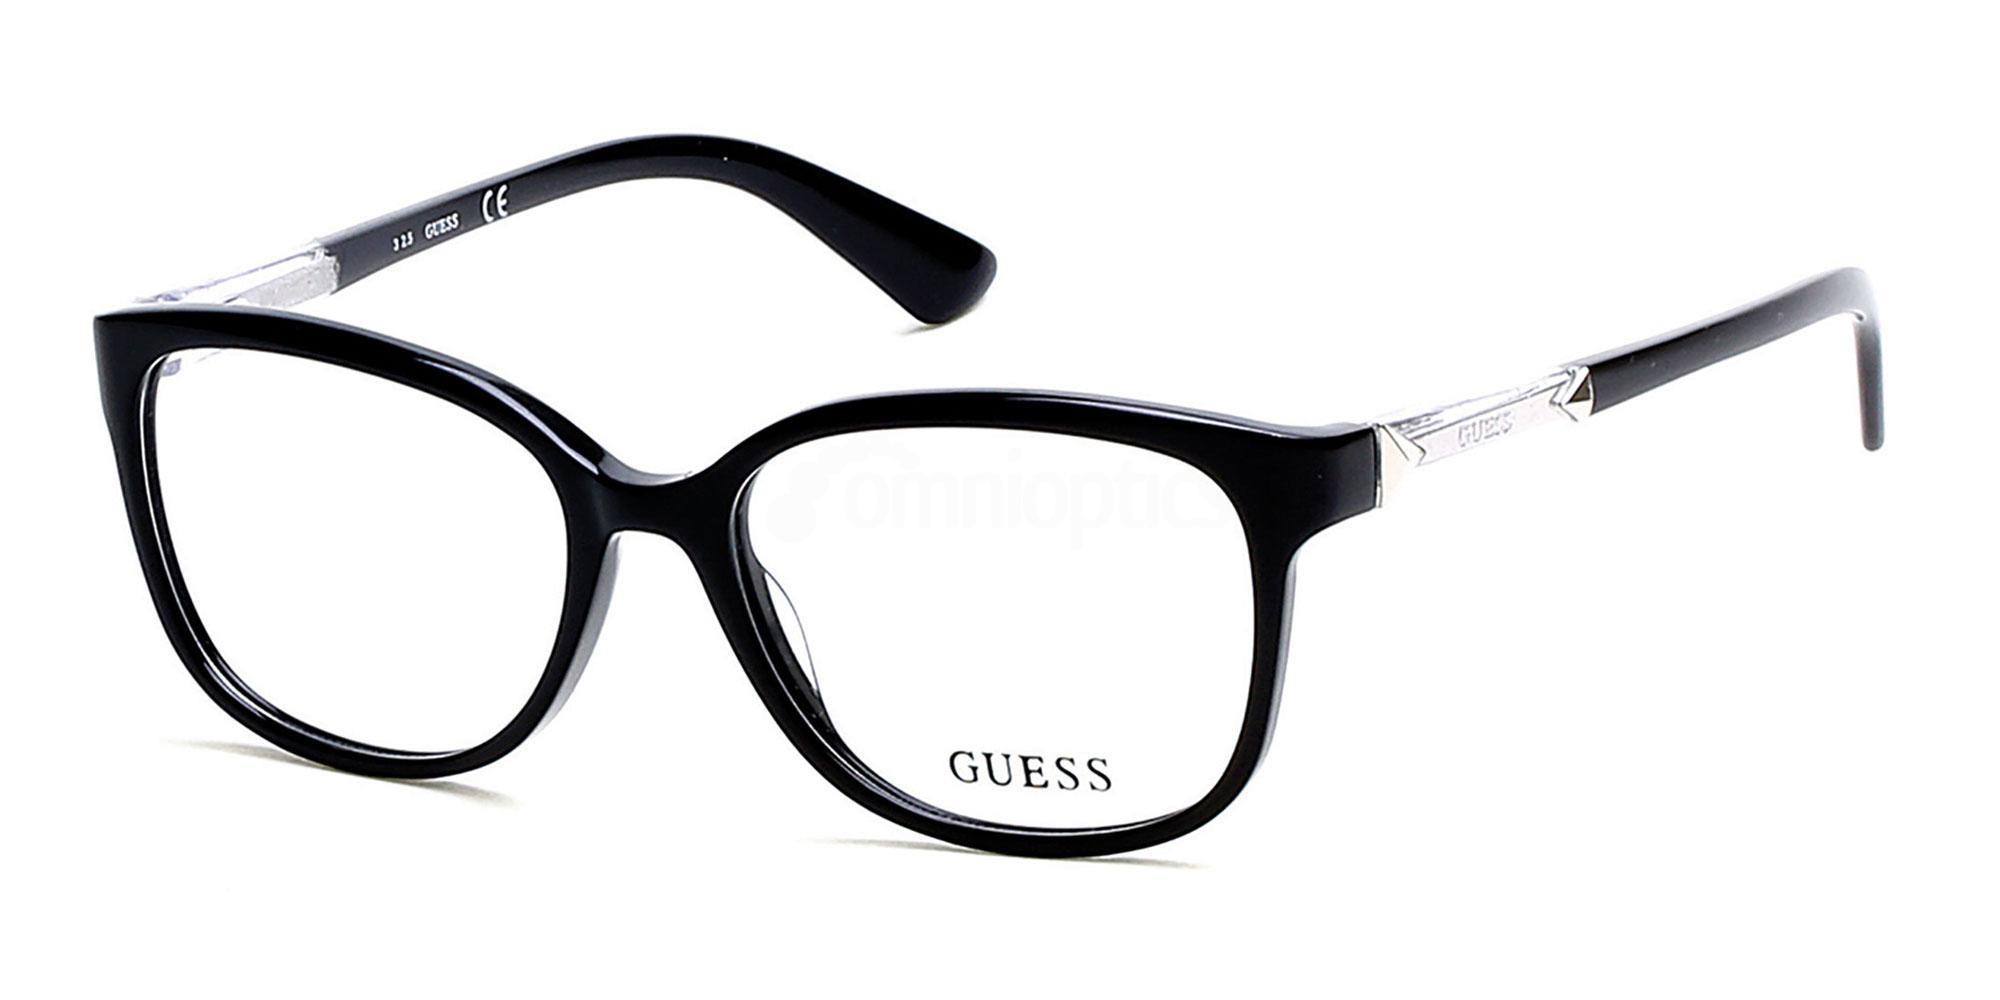 001 GU2580 , Guess